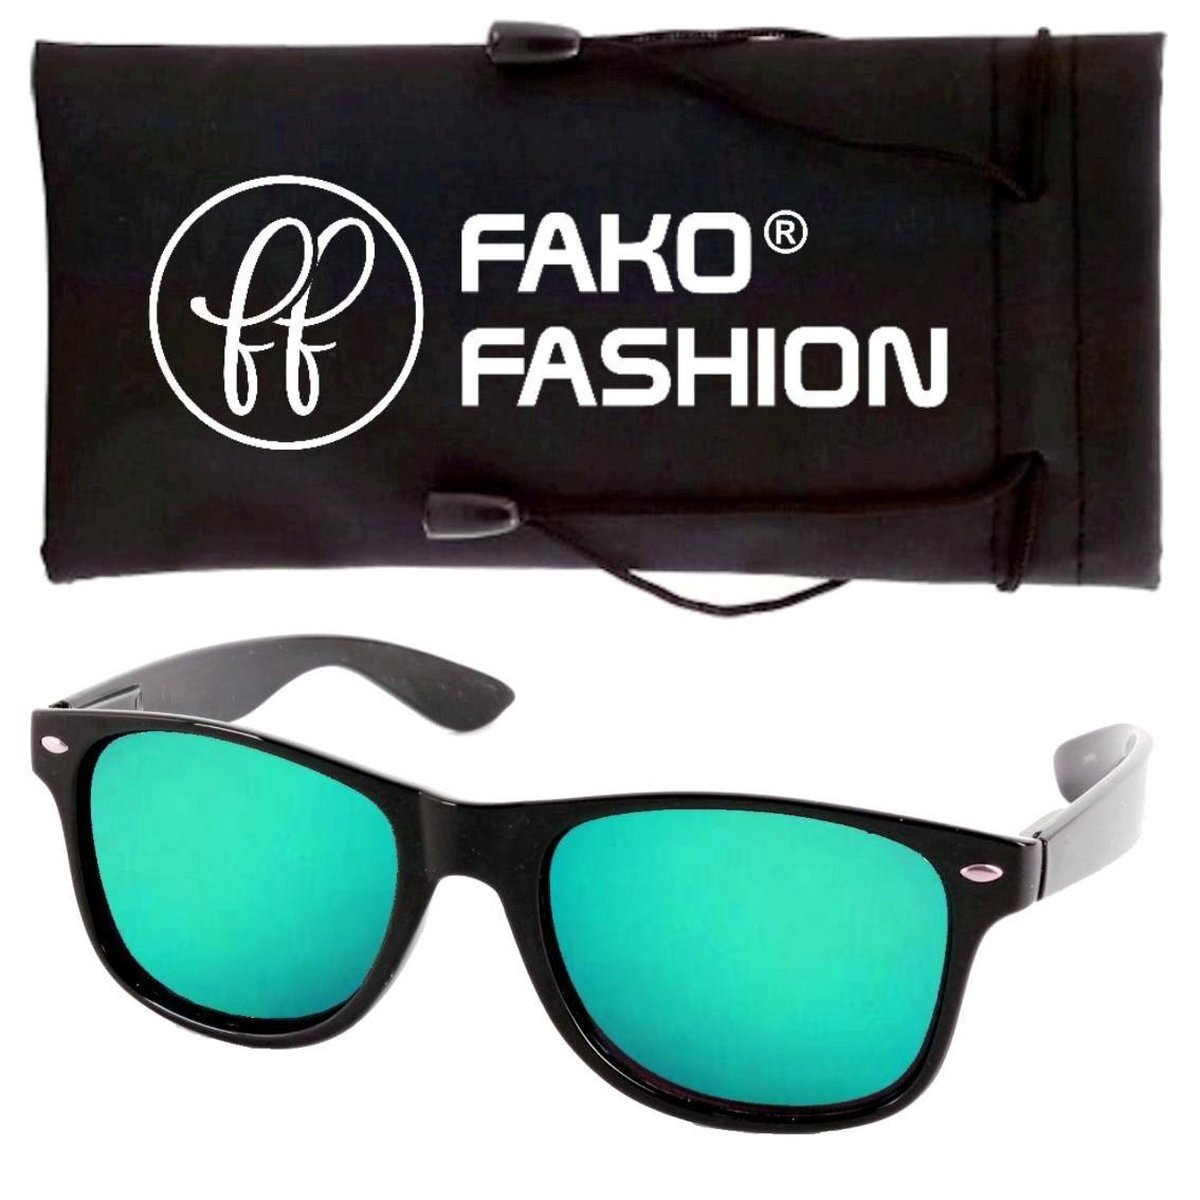 Fako Fashion® - Kinder Zonnebril - Wayfarer - Spiegel Aqua - Fako Fashion®